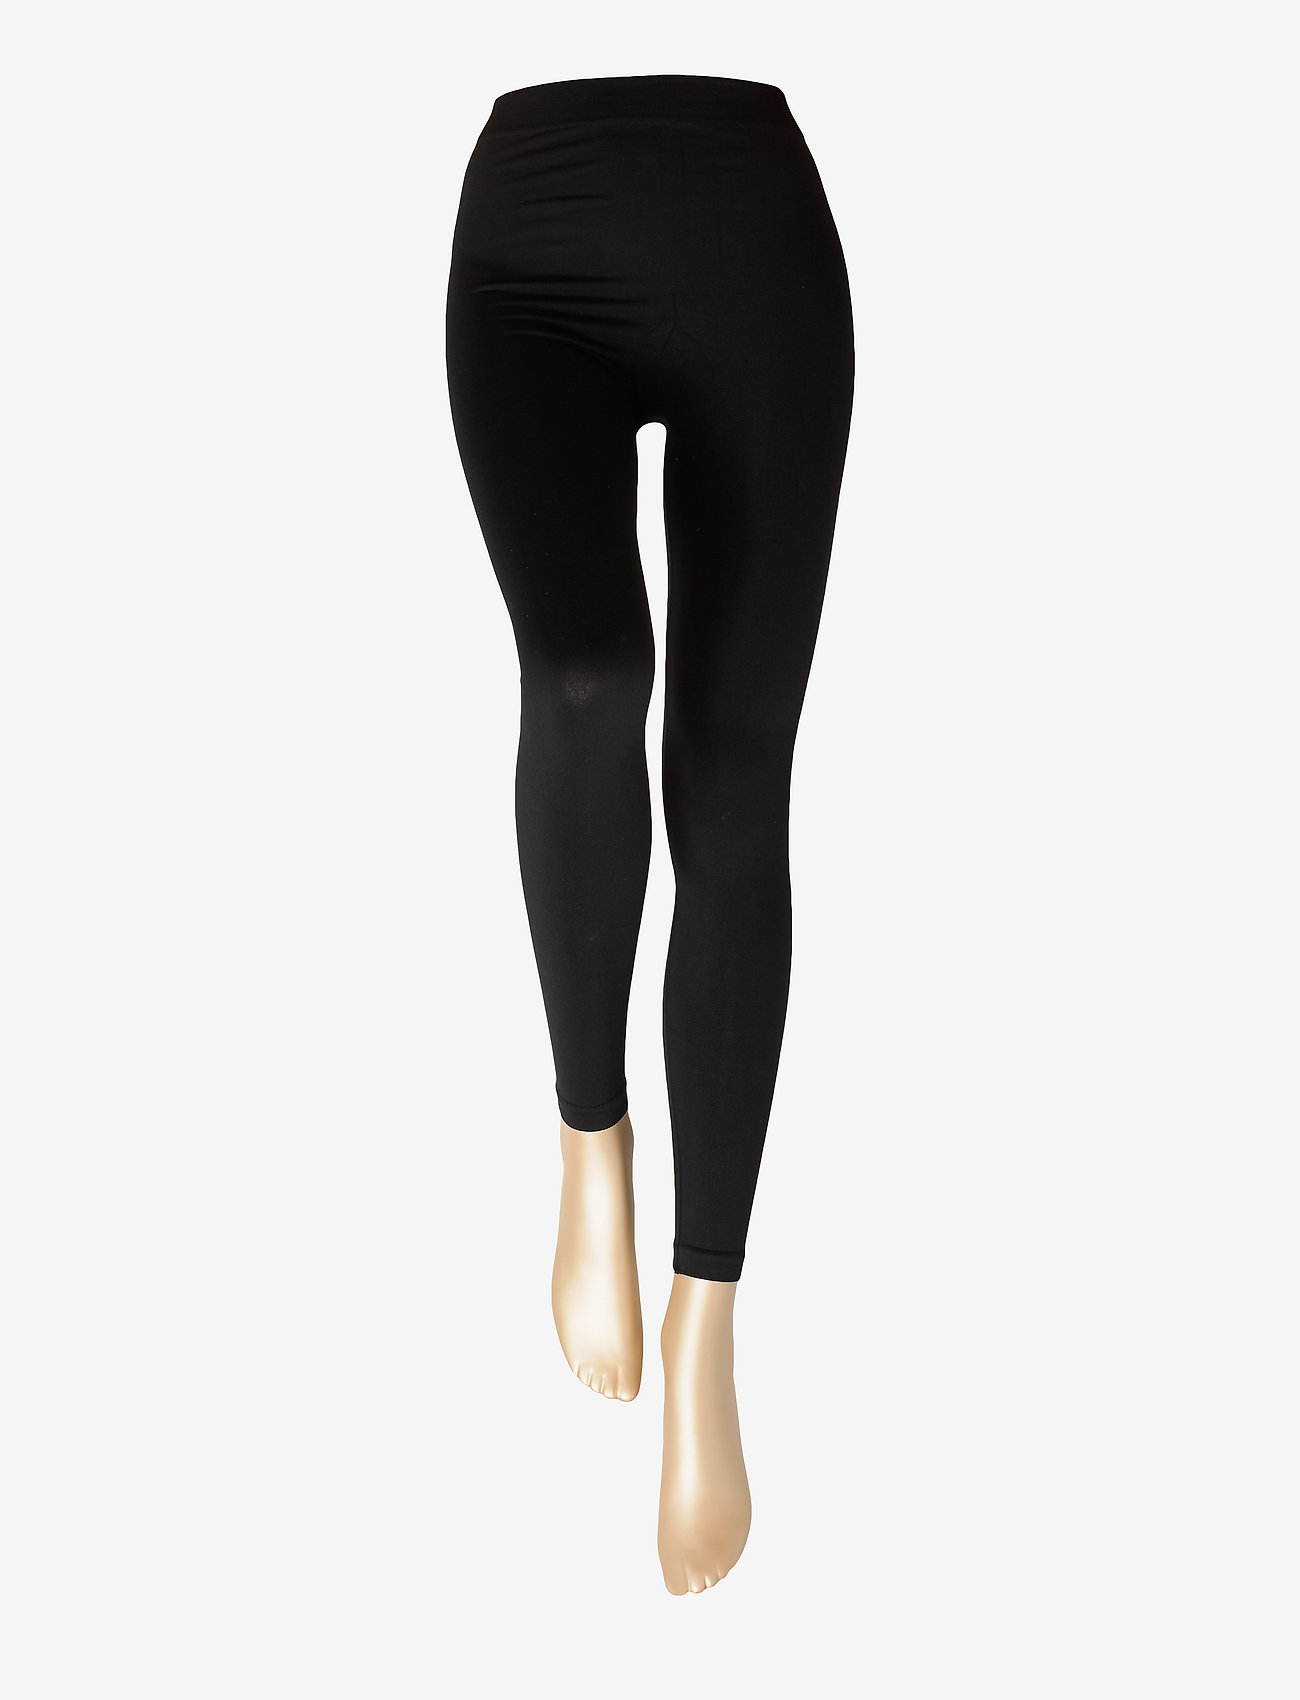 Swedish Stockings Gerda Premium Leggings 180 Den - & Tights